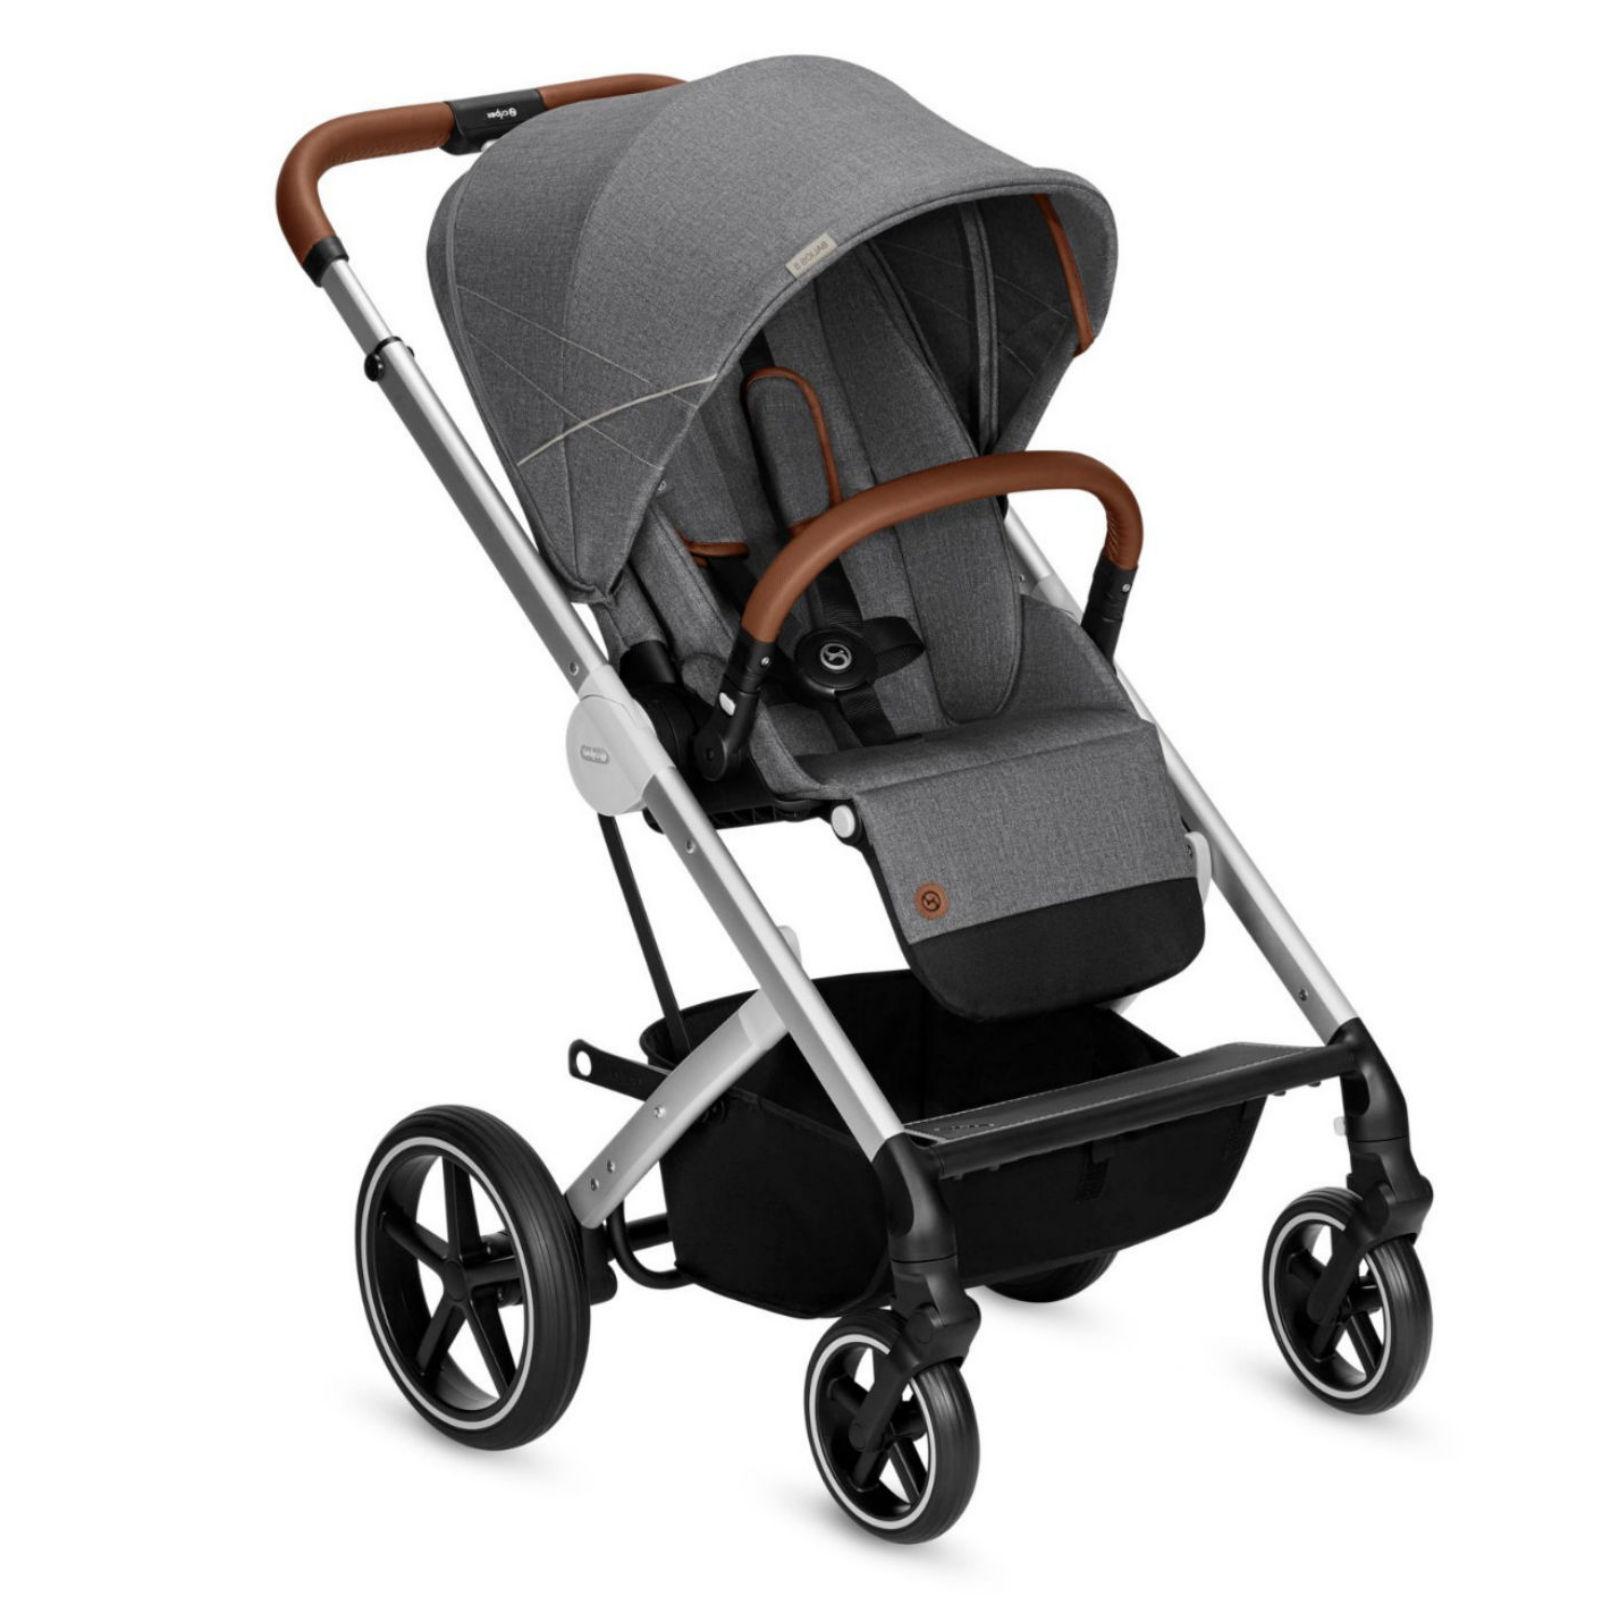 cybex balios s pushchair denim edition manhattan grey buy at online4baby. Black Bedroom Furniture Sets. Home Design Ideas